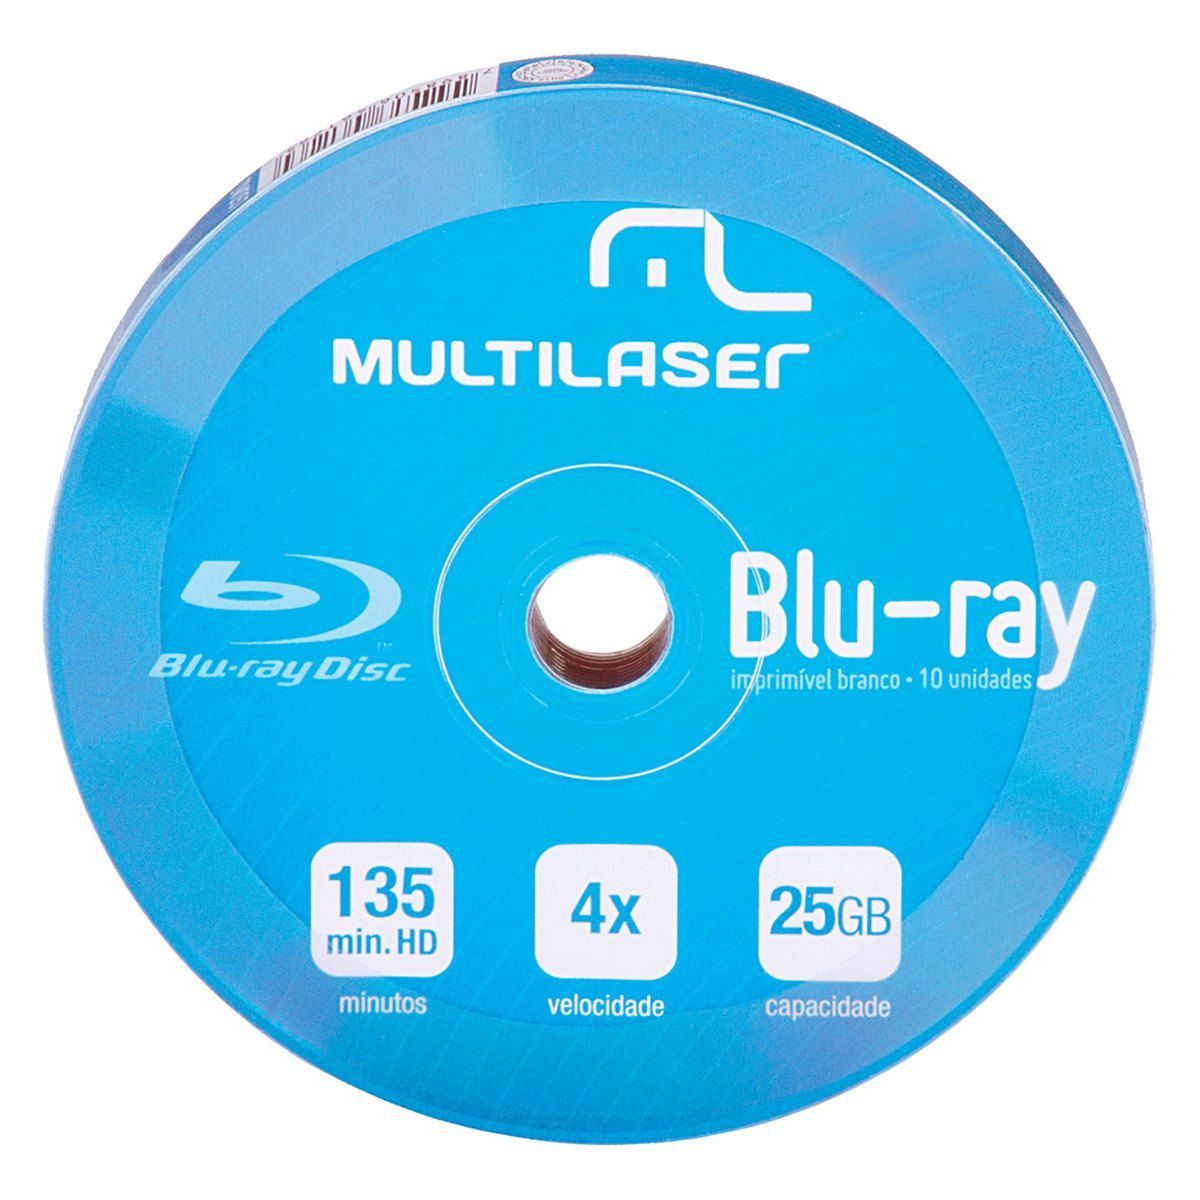 Mídia Virgem Blu-ray Shirink Multilaser 4x Imprimível com 10 Unidades DV057